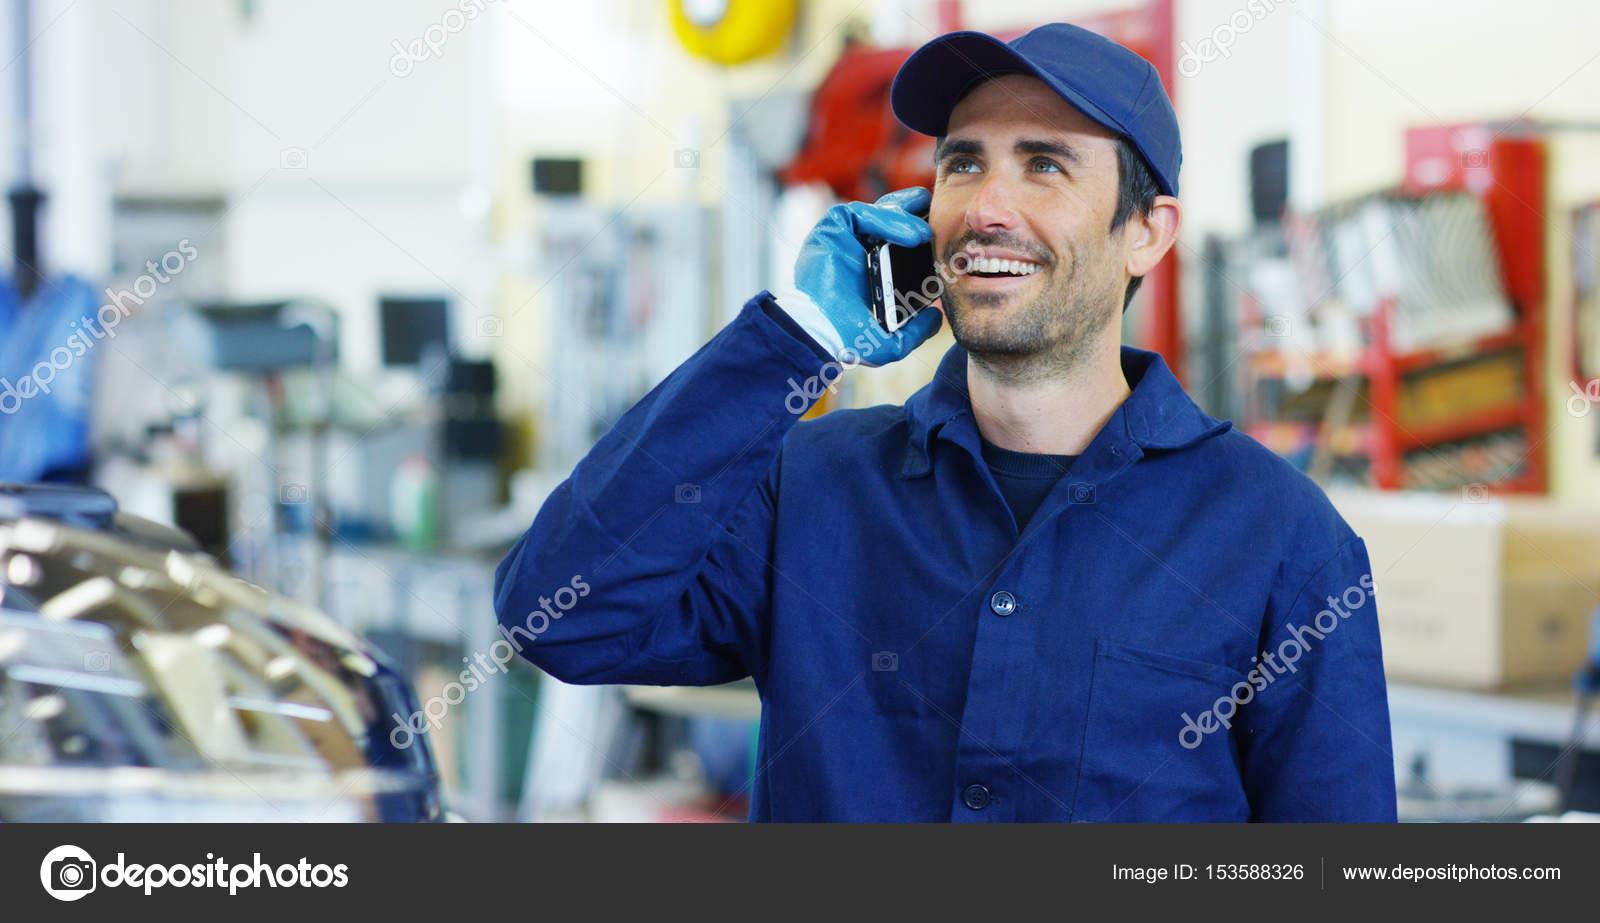 Assistent-Mechaniker fordert Kunden Kommunikation, im